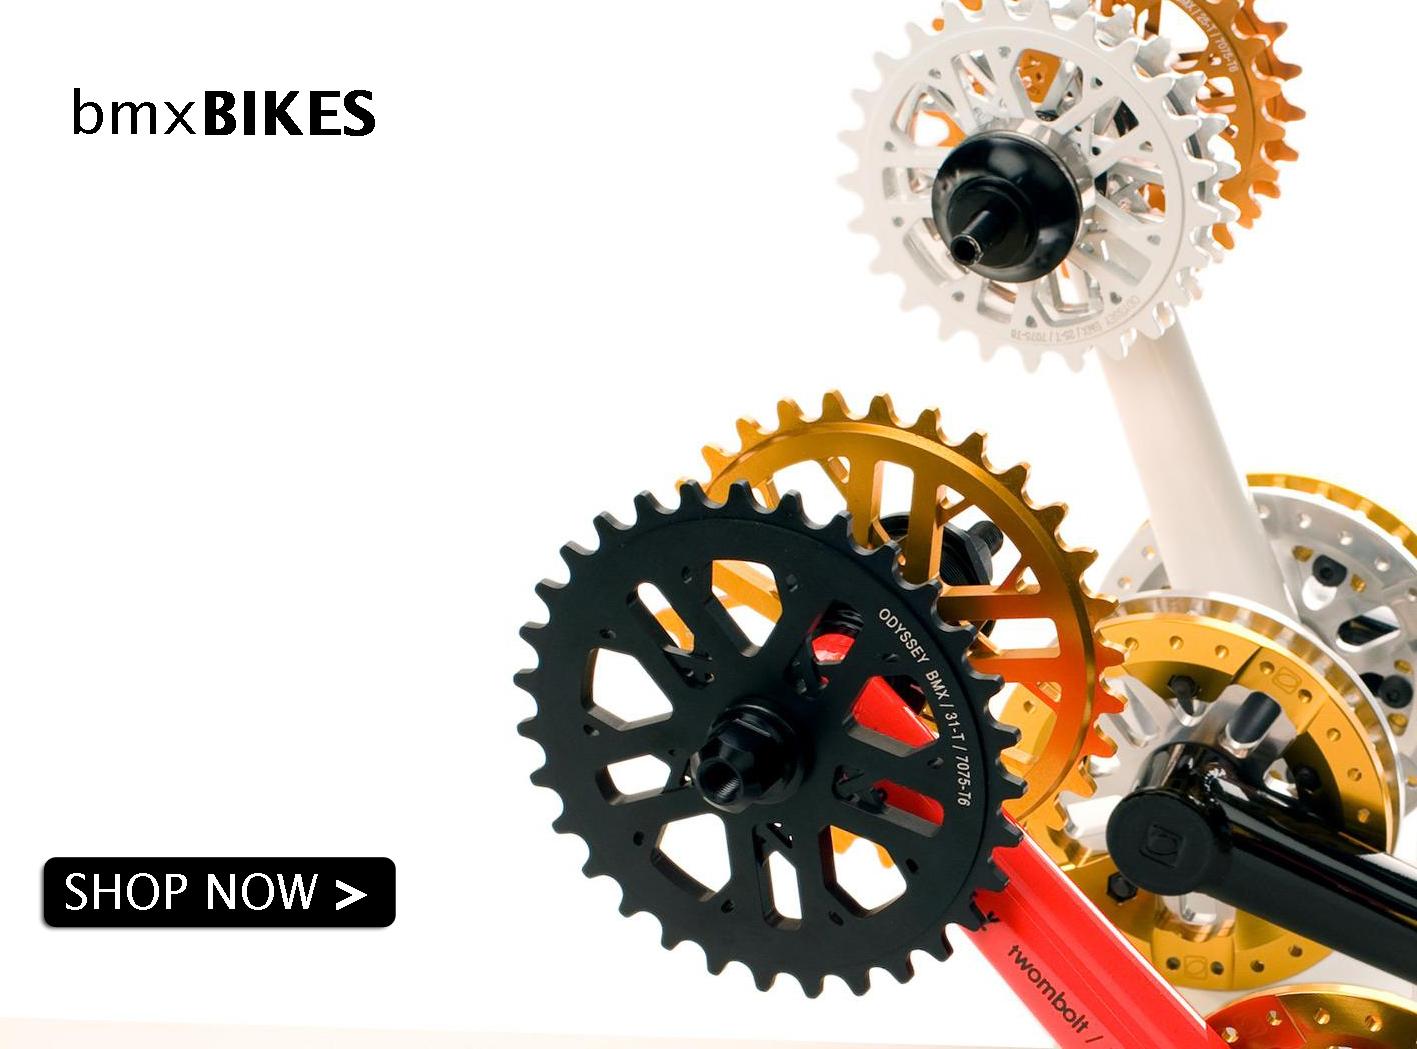 RollBack BMX Bikes